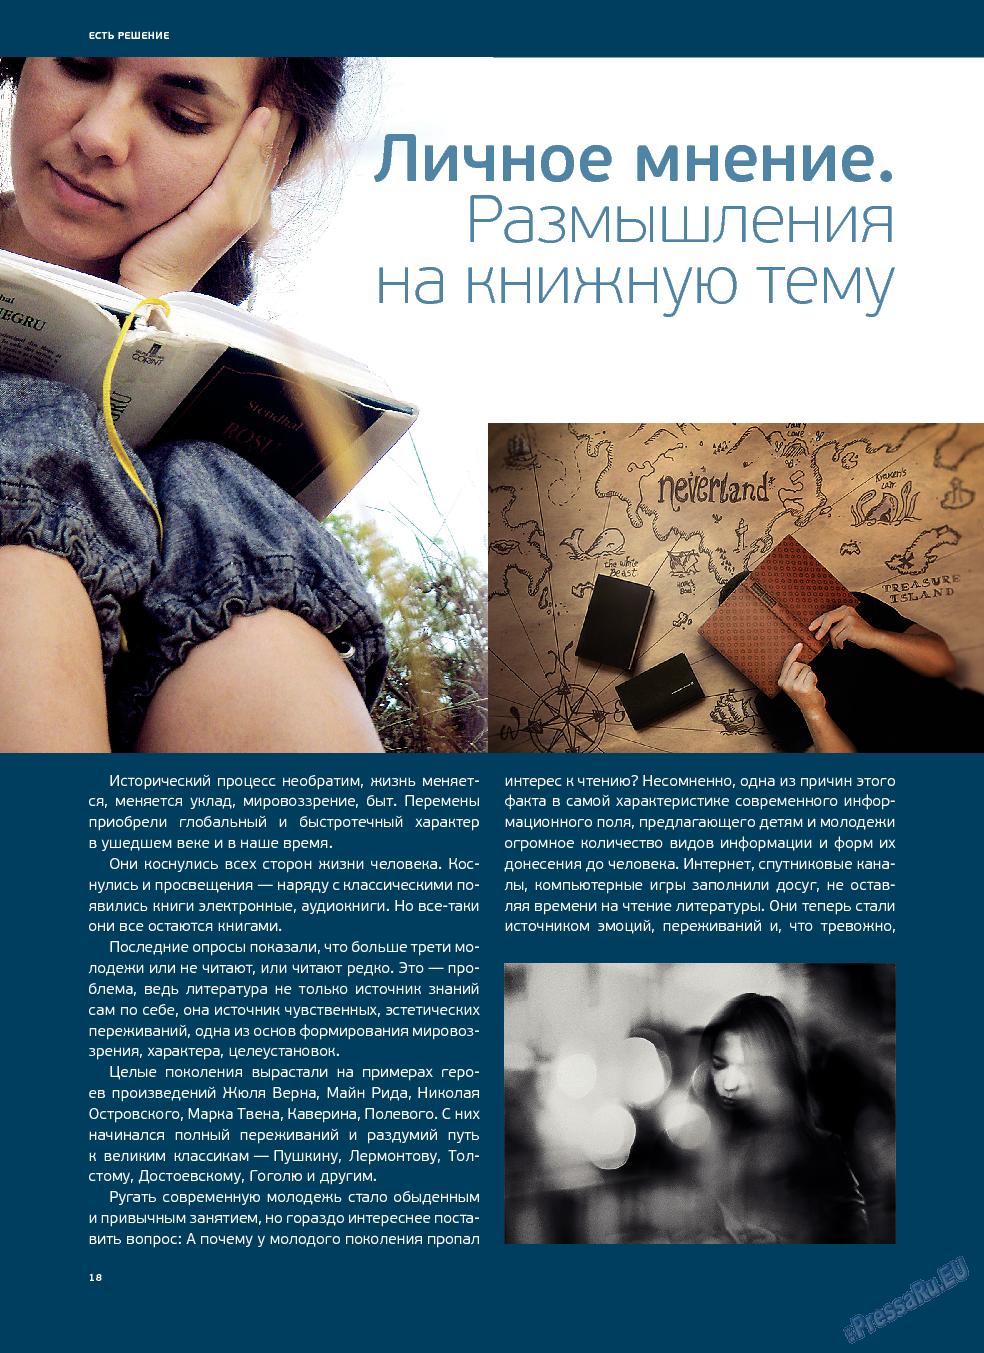 Артек (журнал). 2013 год, номер 5, стр. 20